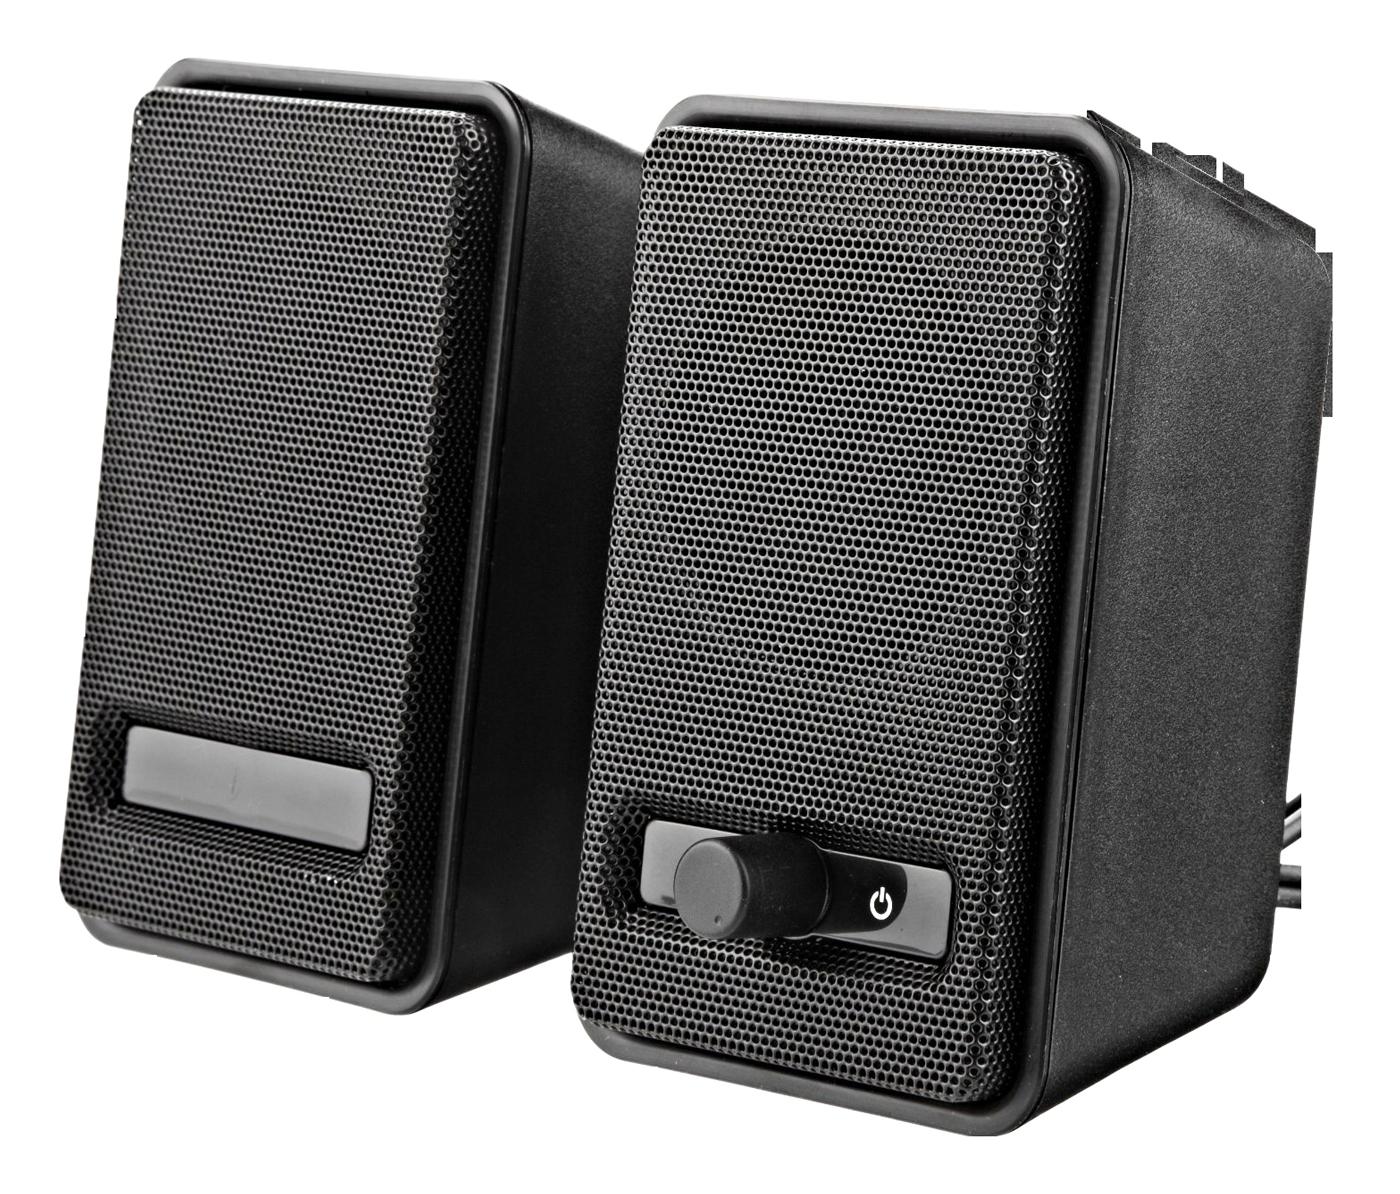 Speaker png image purepng. Speakers clipart woofer